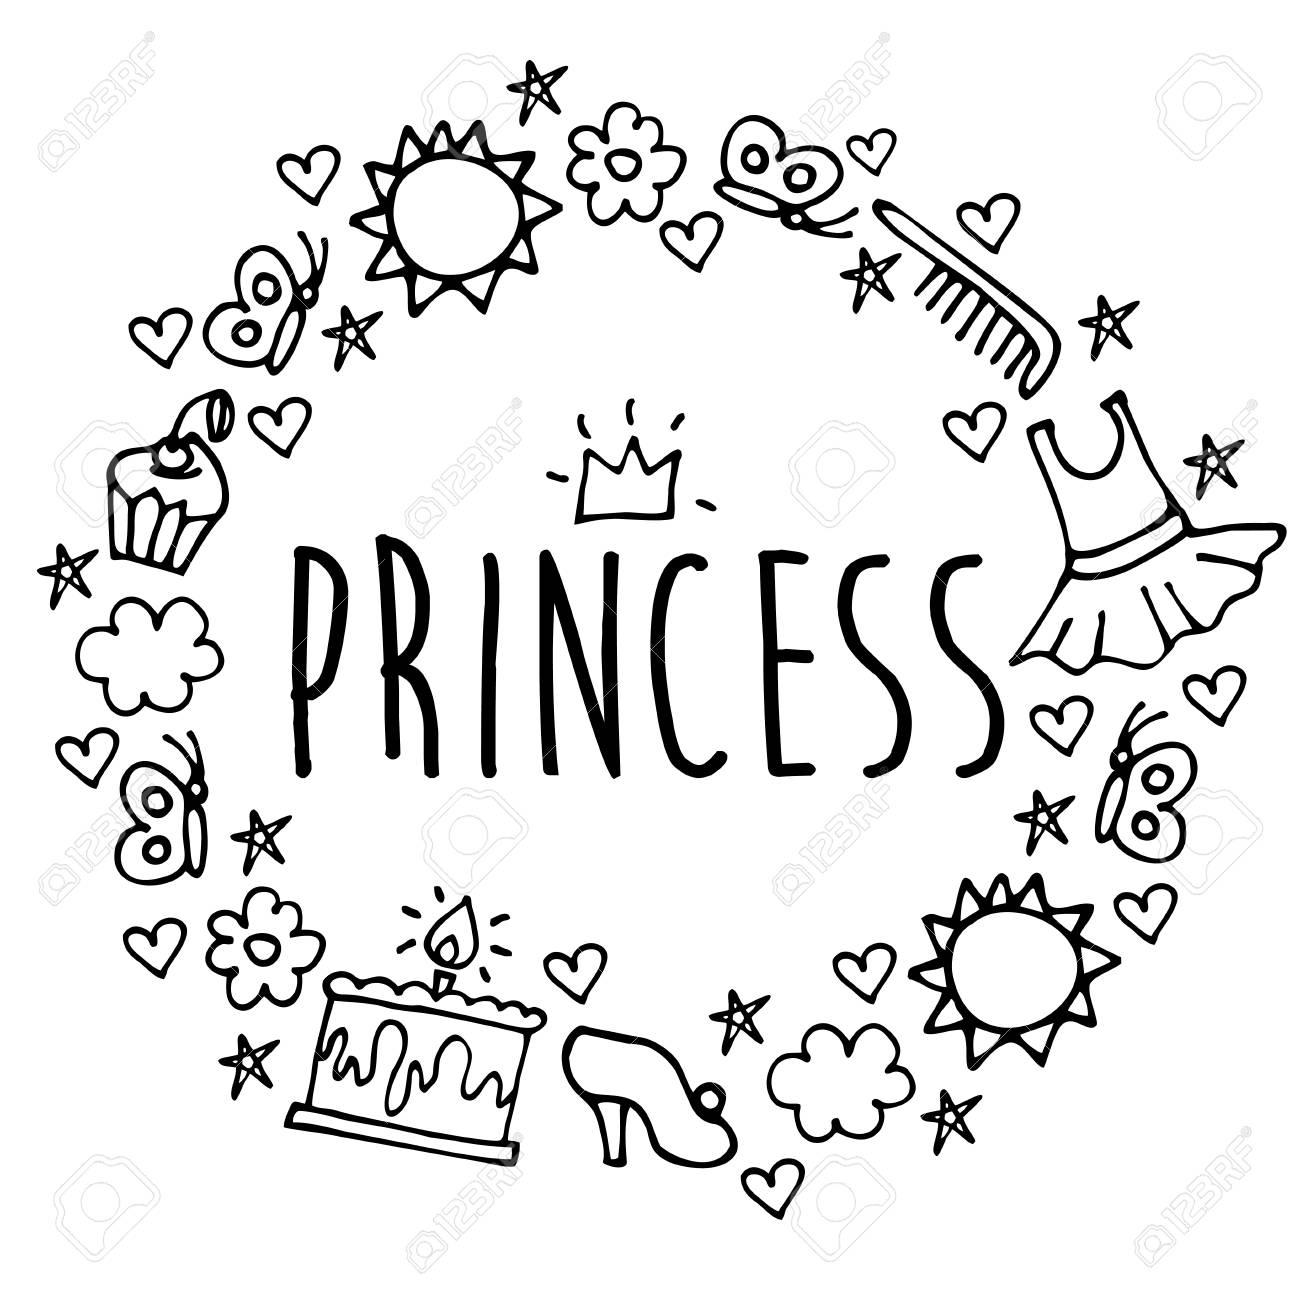 Princess Greeting Card Postcard Poster Birthday Invitation Typography